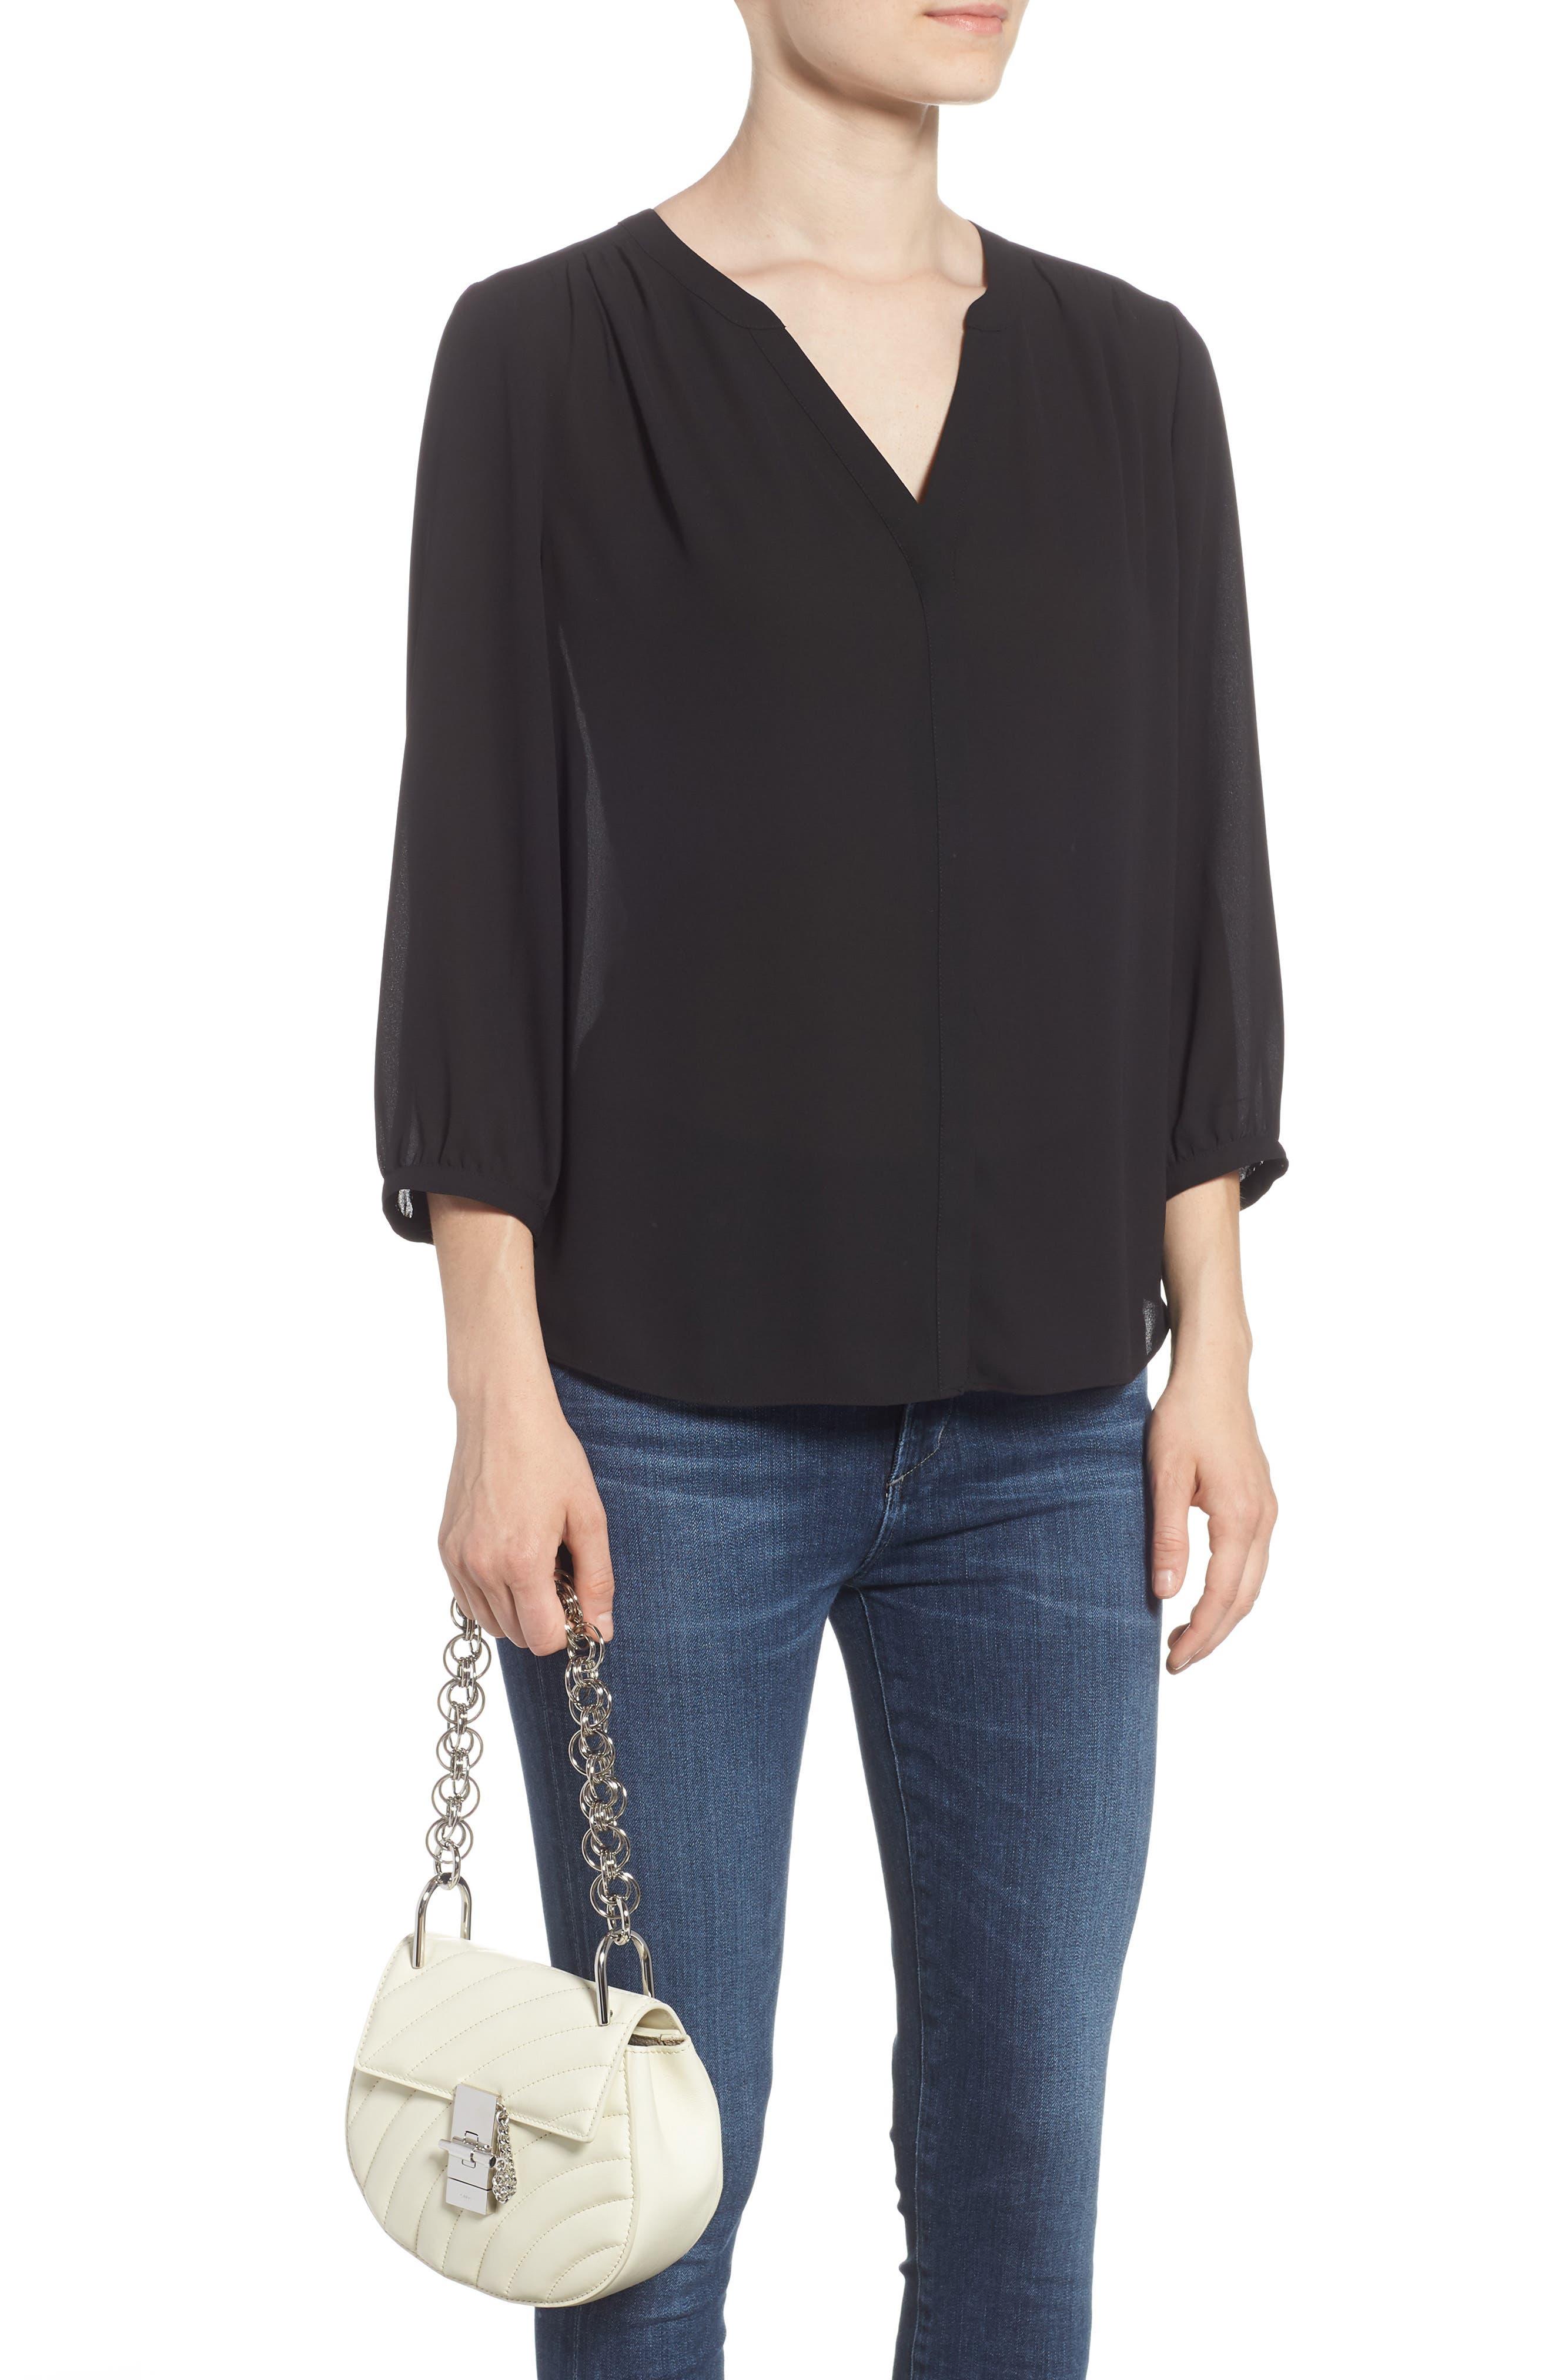 Mini Drew Bijoux Leather Shoulder Bag,                             Alternate thumbnail 2, color,                             Natural White